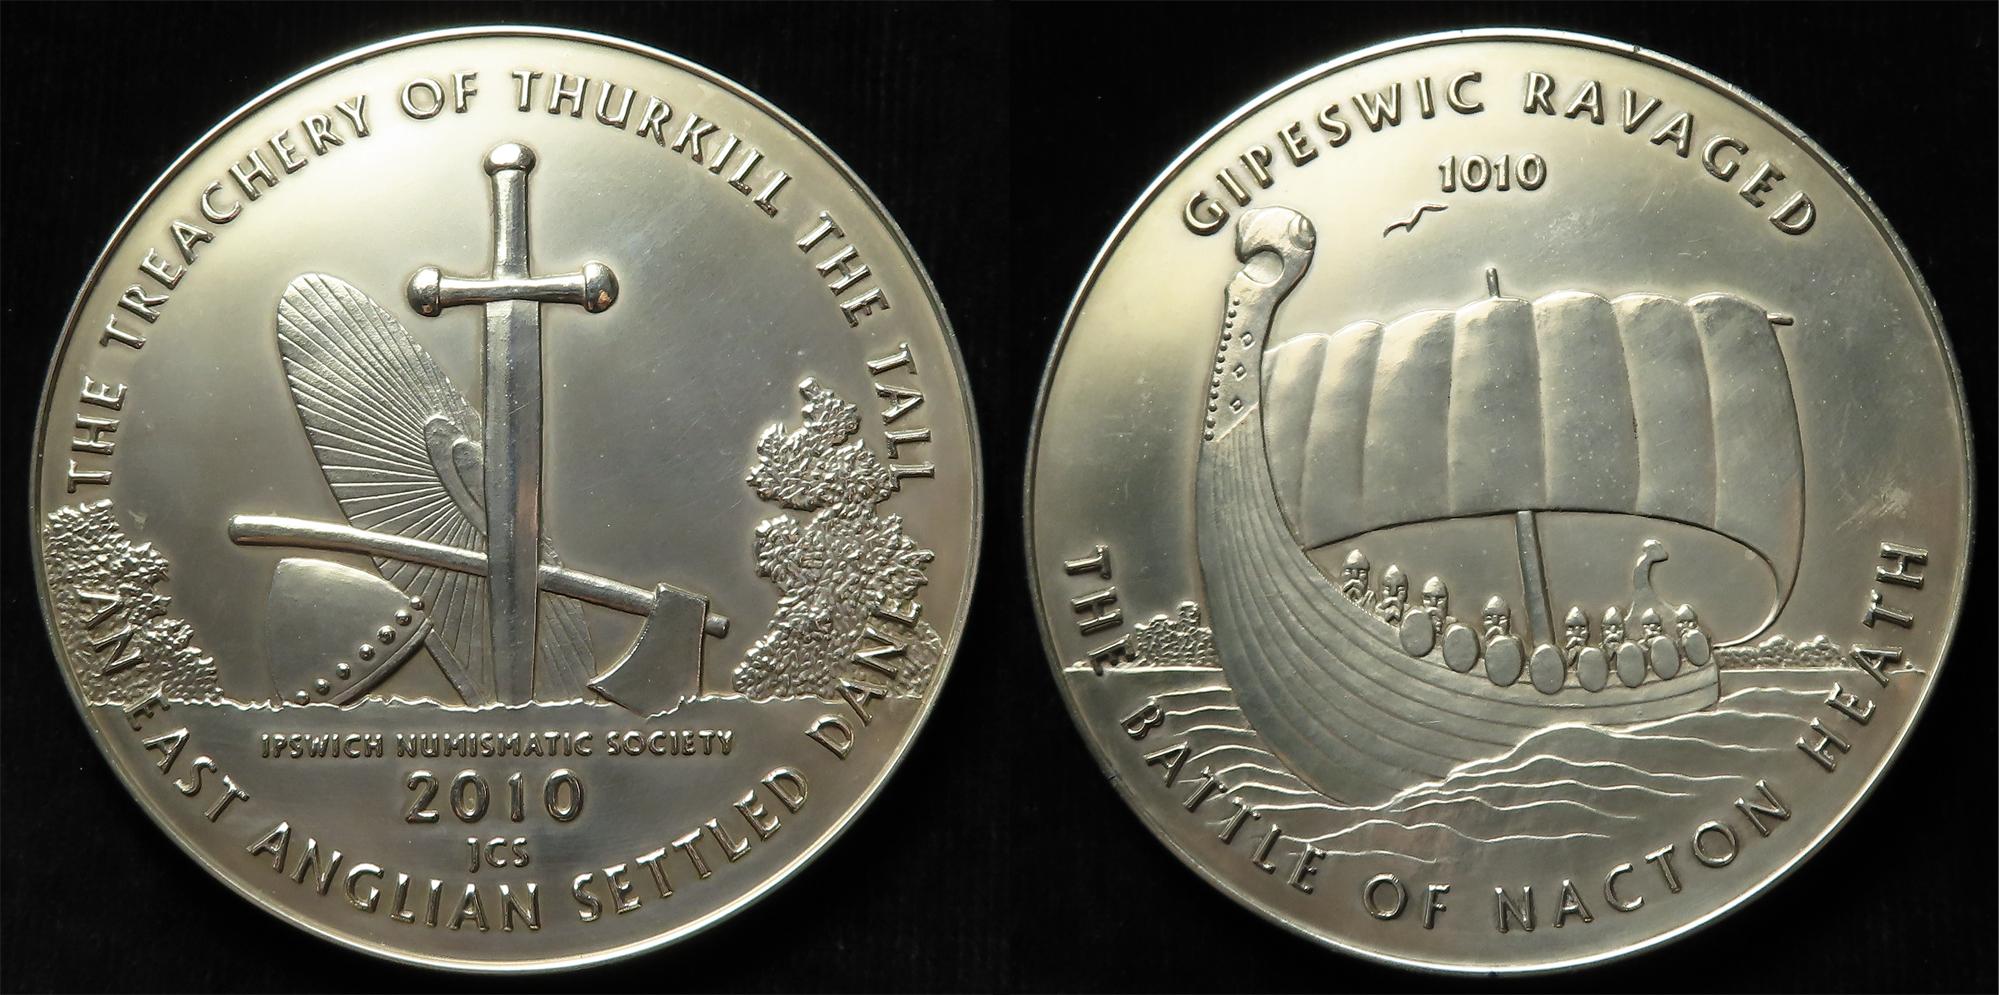 British Commemorative Medal, hallmarked sterling silver d.75mm, 173.08g: The Treachery of Thurkill